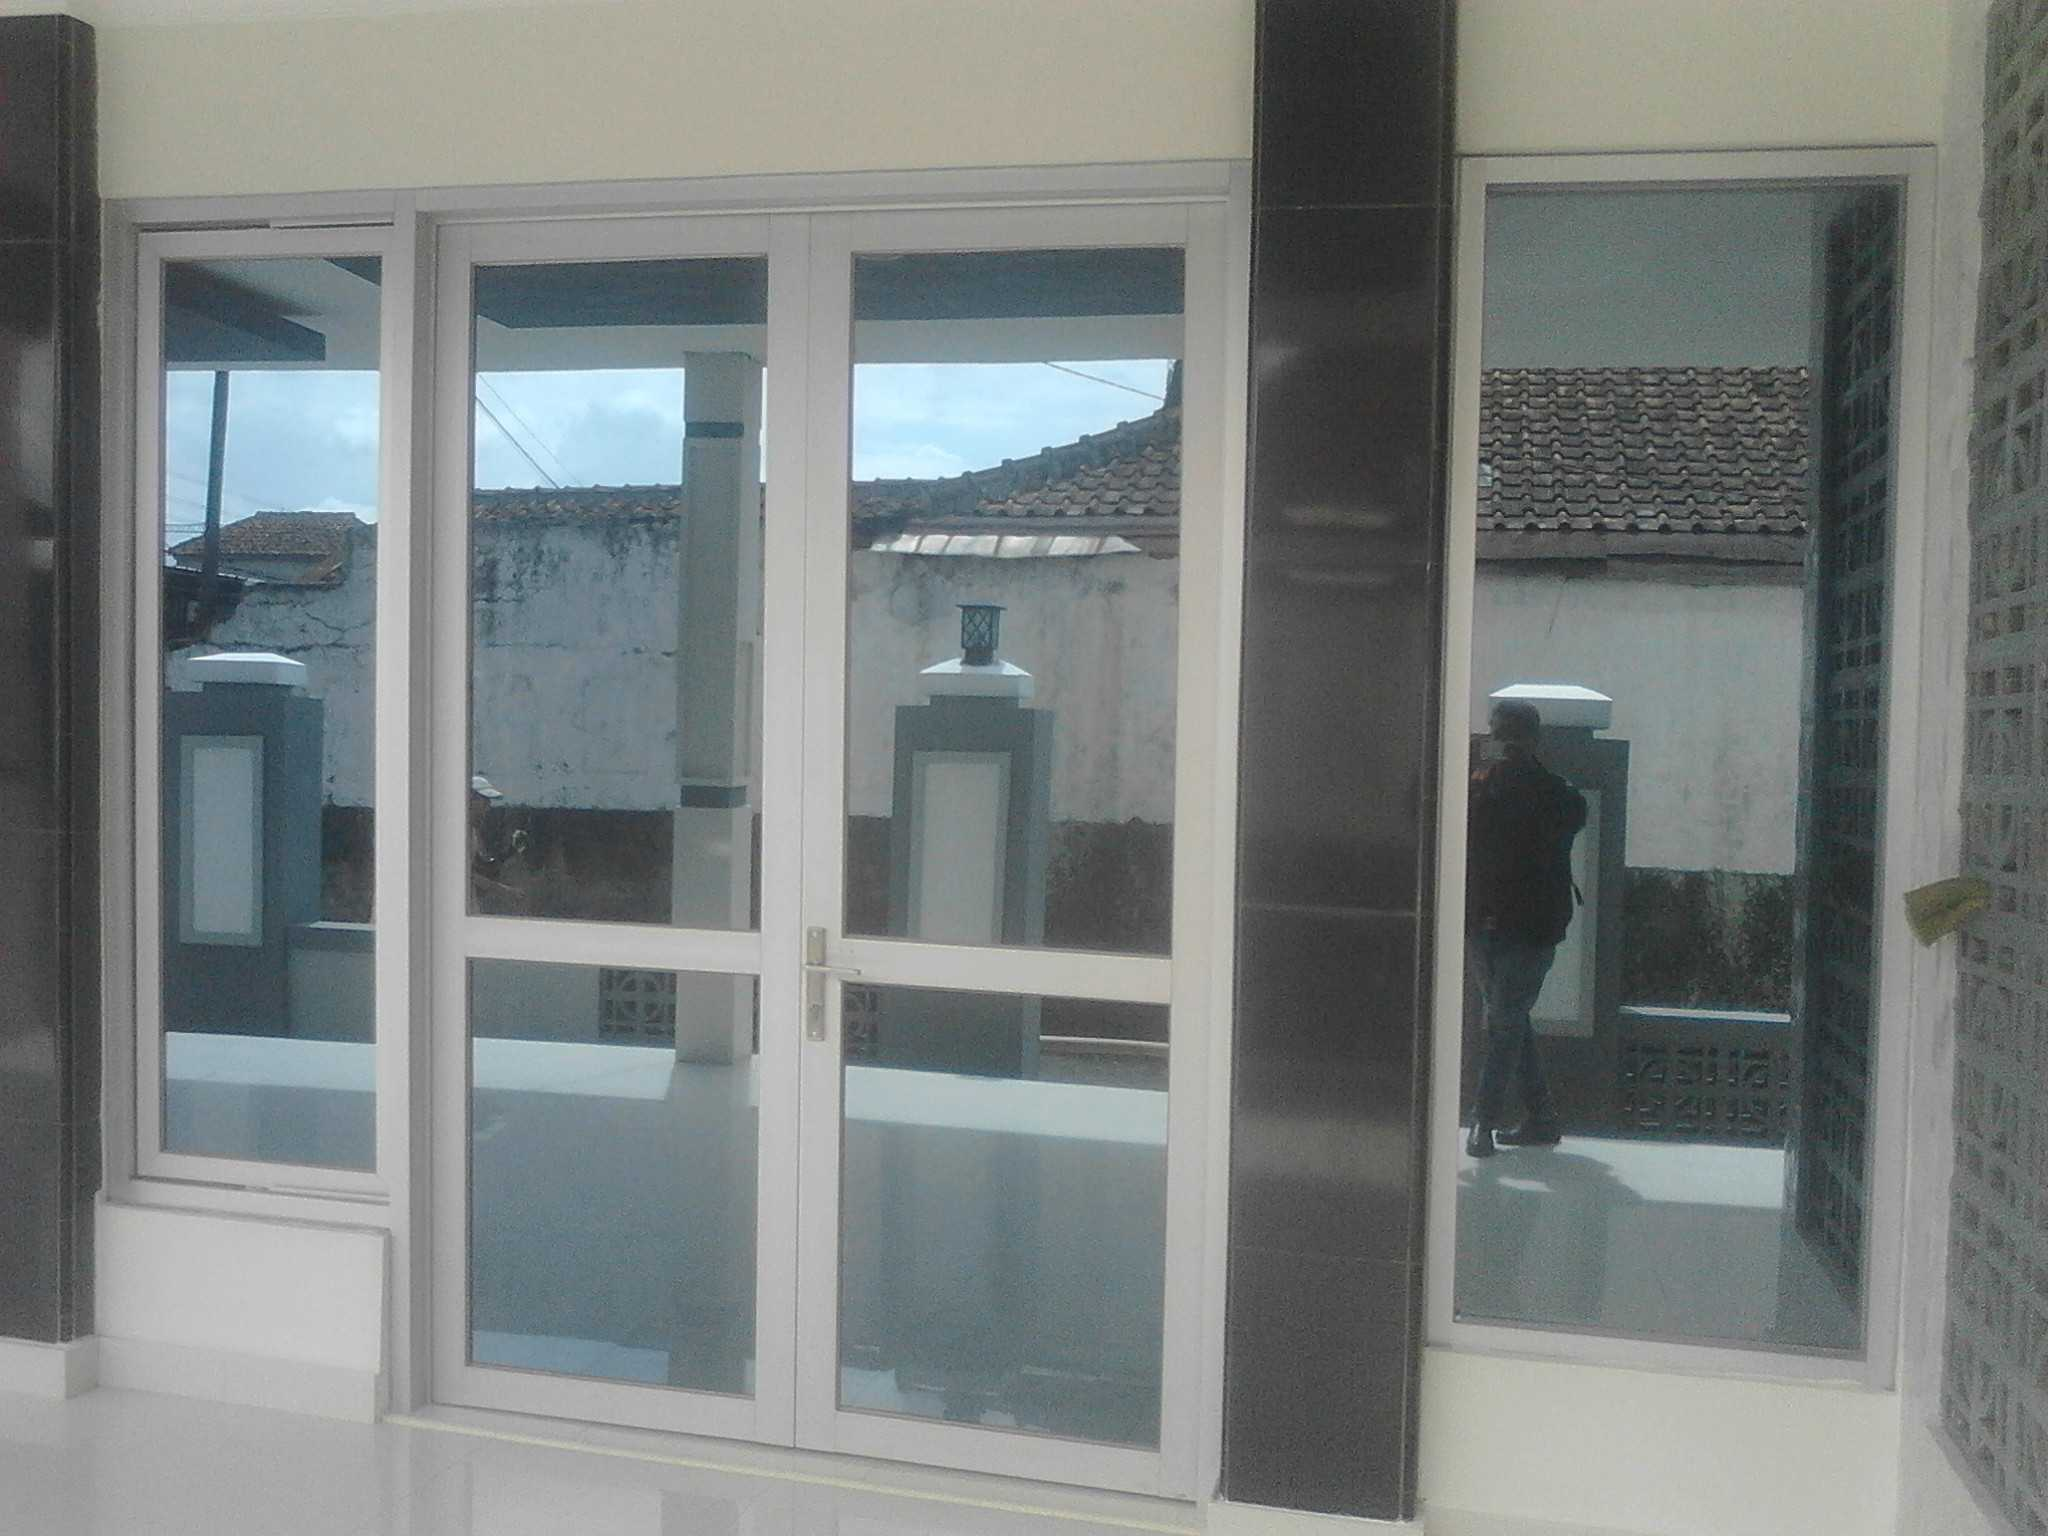 Archdesignbuild7 Mesjid Nasrullah  Soreang, West Java Soreang, West Java Img20170109103545 Modern  20784